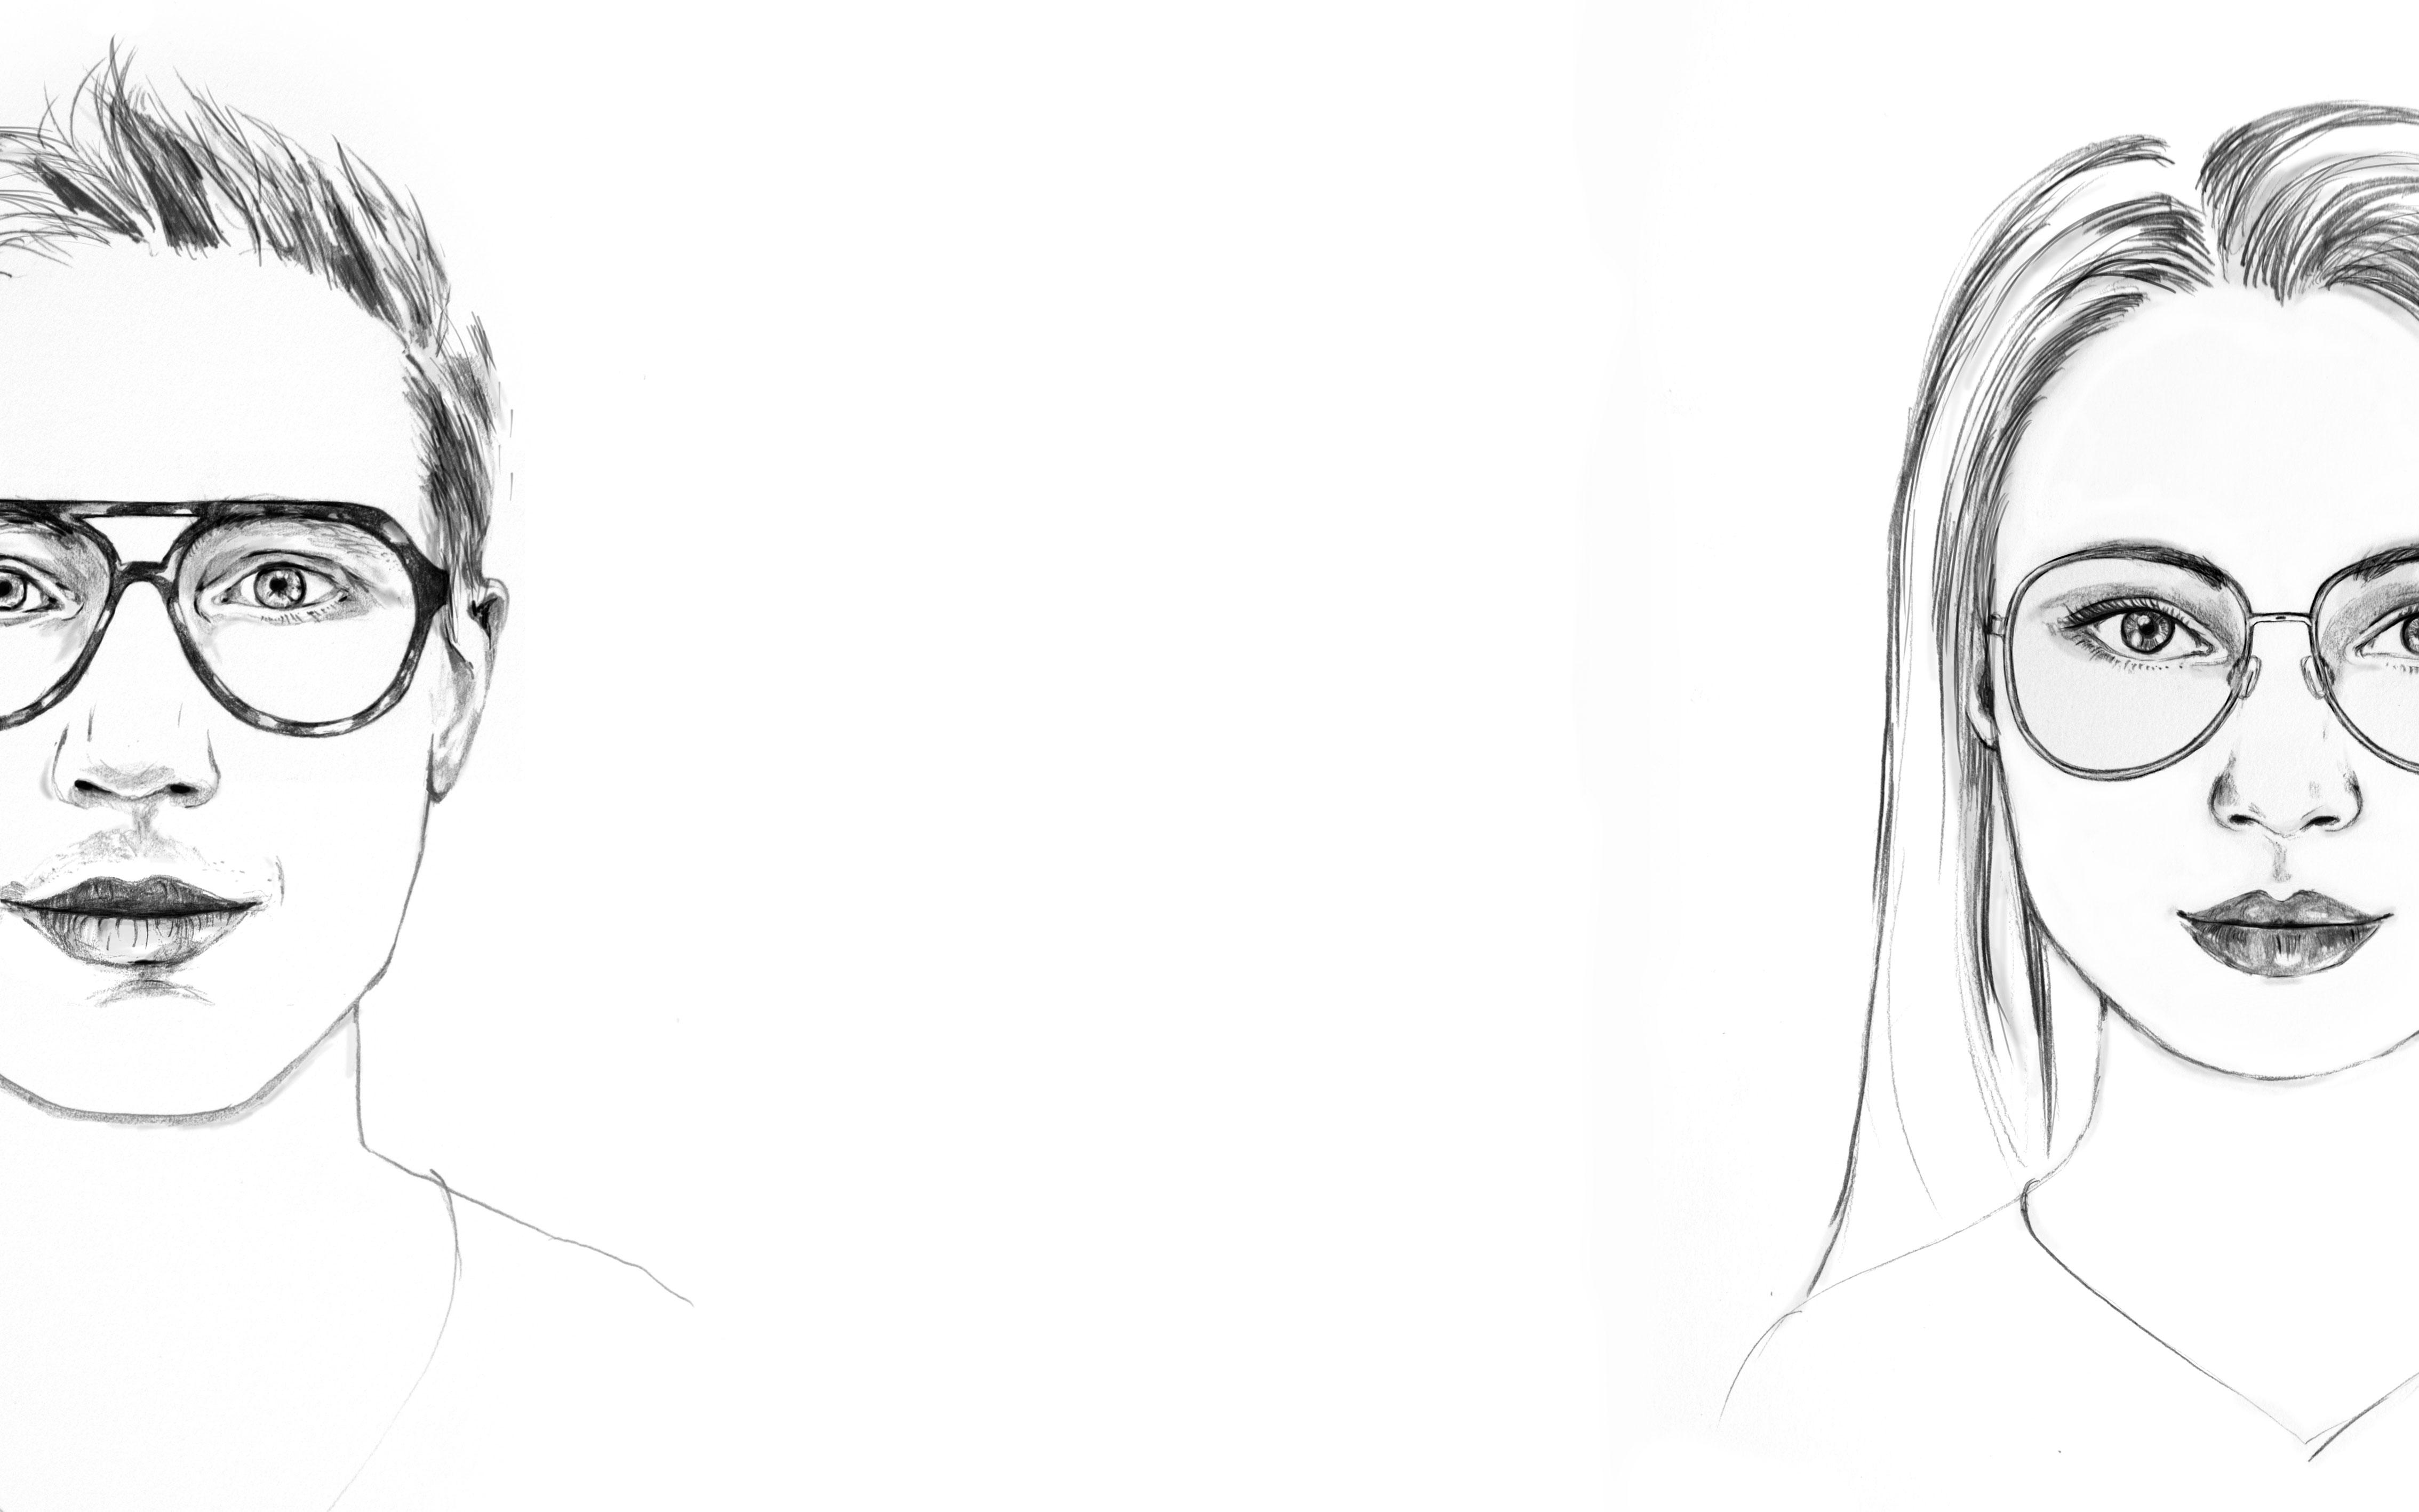 bec_kilpatrick_illustration_sunglasses_soleurs